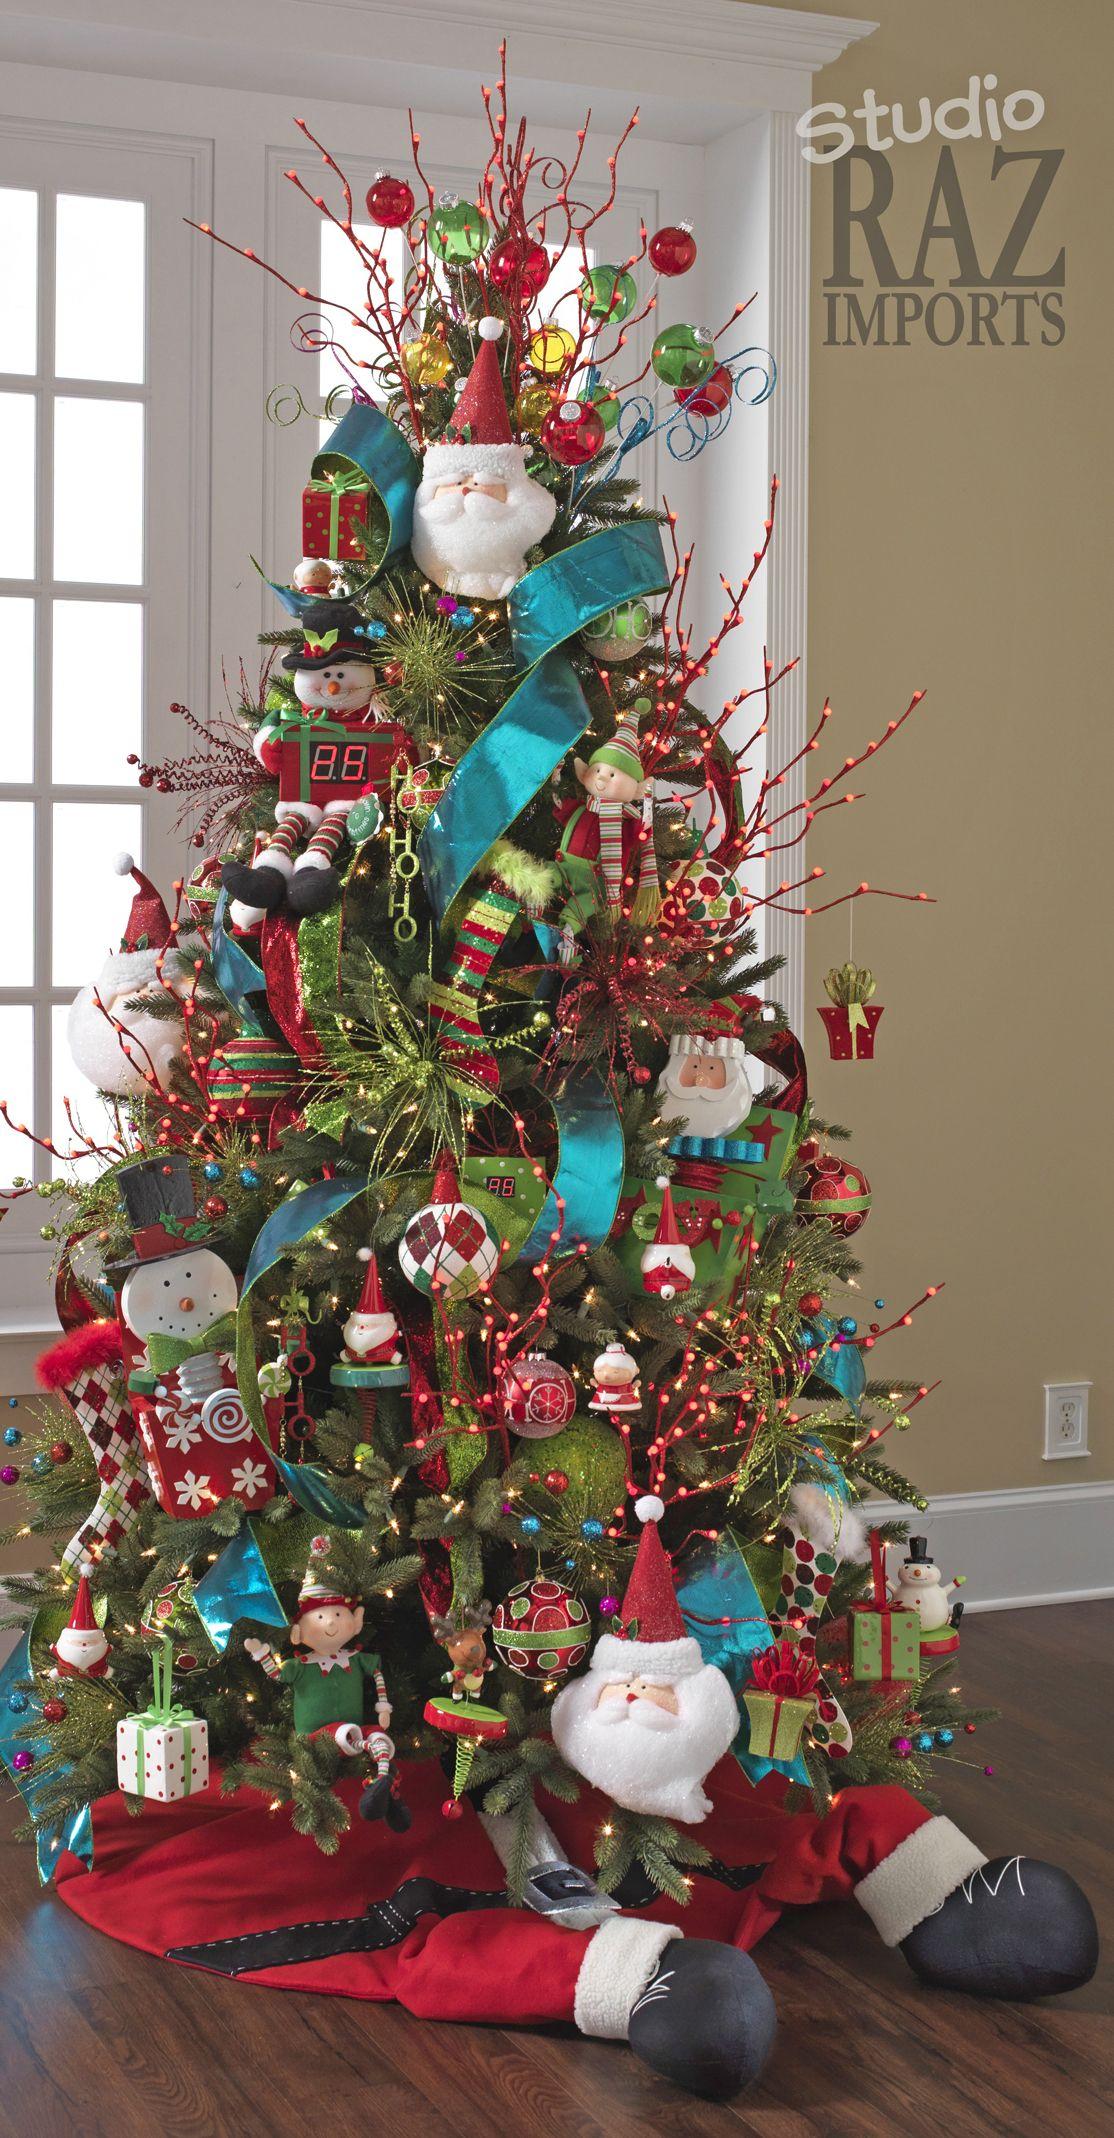 10 Elegant Christmas Tree Decorating Ideas With Multi Colored Lights 30 festive christmas tree decoration ideas christmas colorful 2021